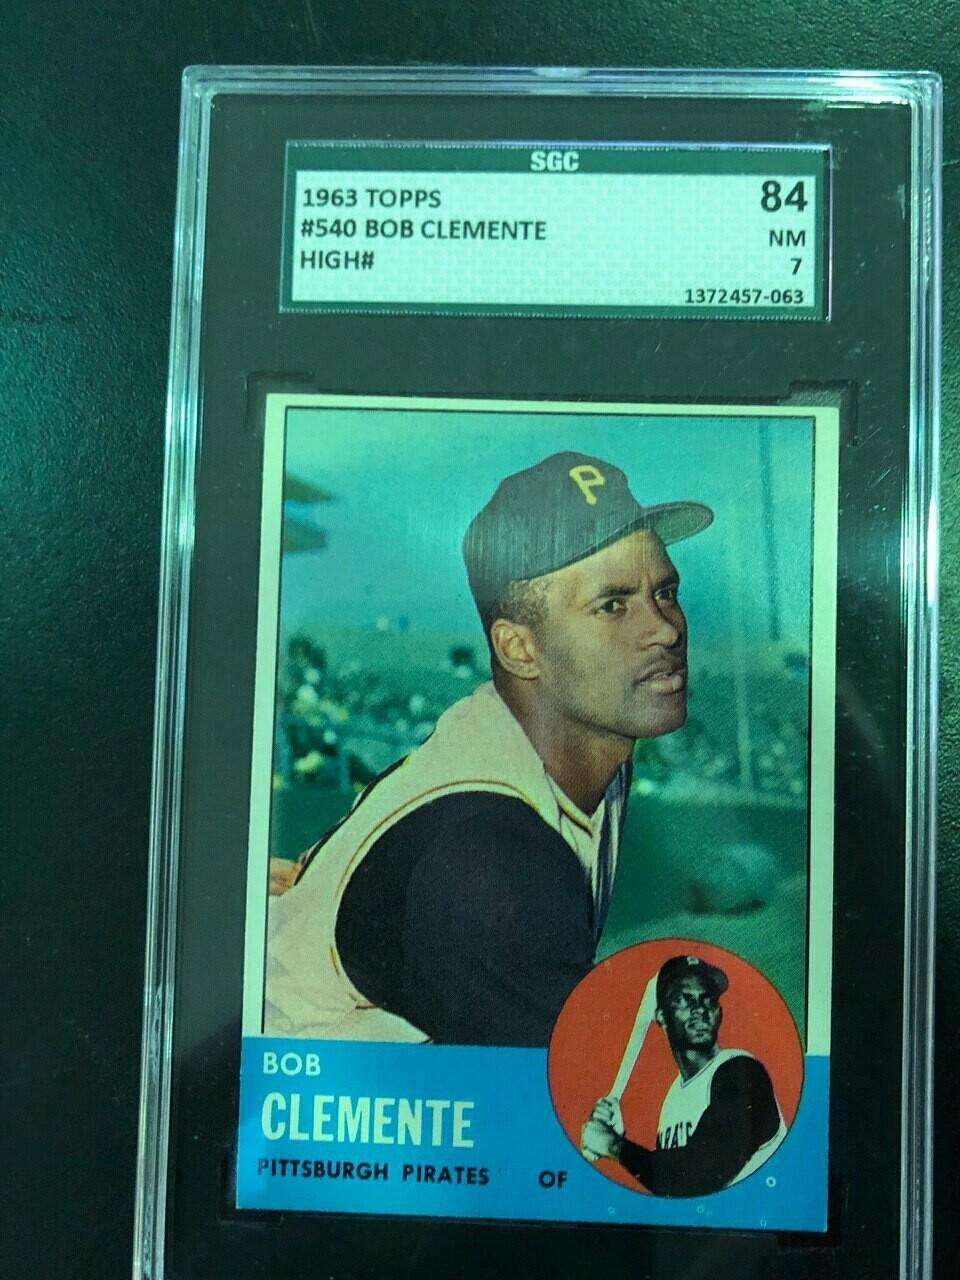 1963 Topps #540 Roberto Clemente SGC graded 7